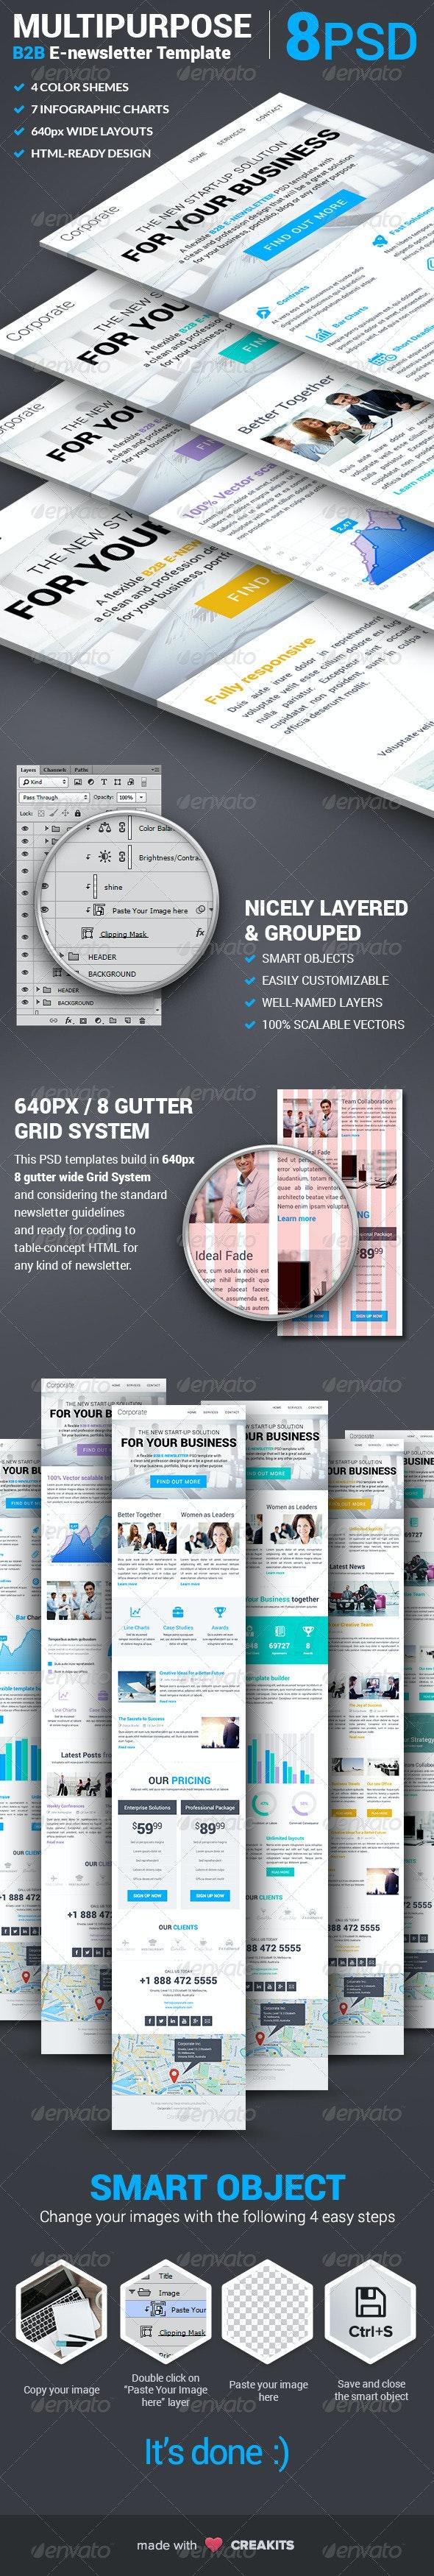 Corporate - Multipurpose B2B E-newsletter Template - E-newsletters Web Elements